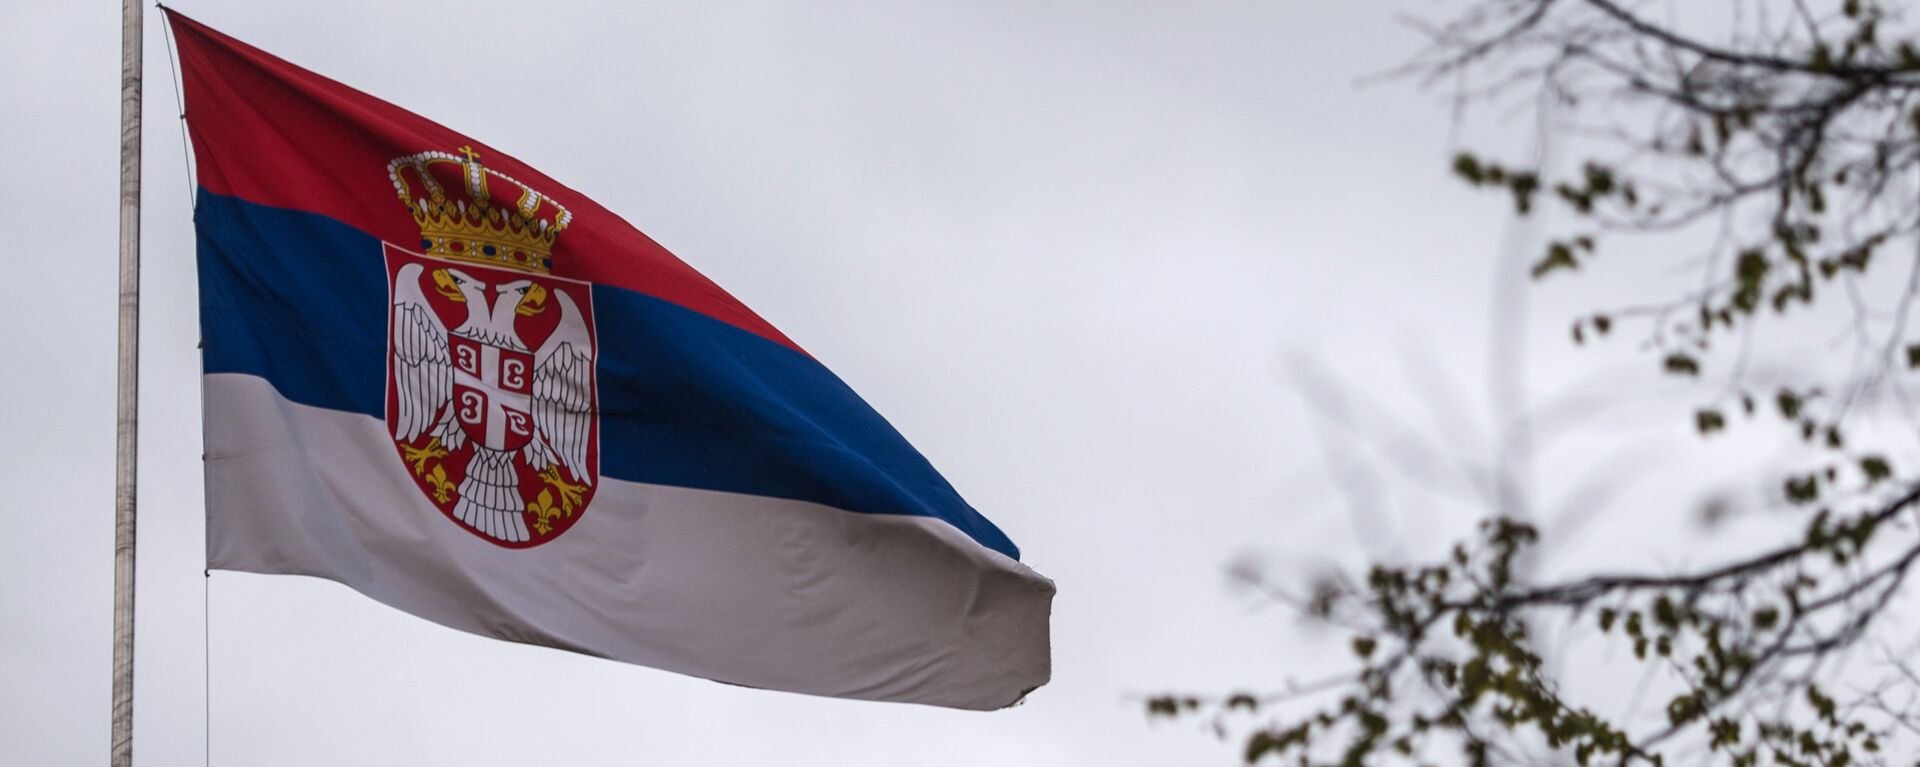 Bandera de Serbia - Sputnik Mundo, 1920, 15.04.2021